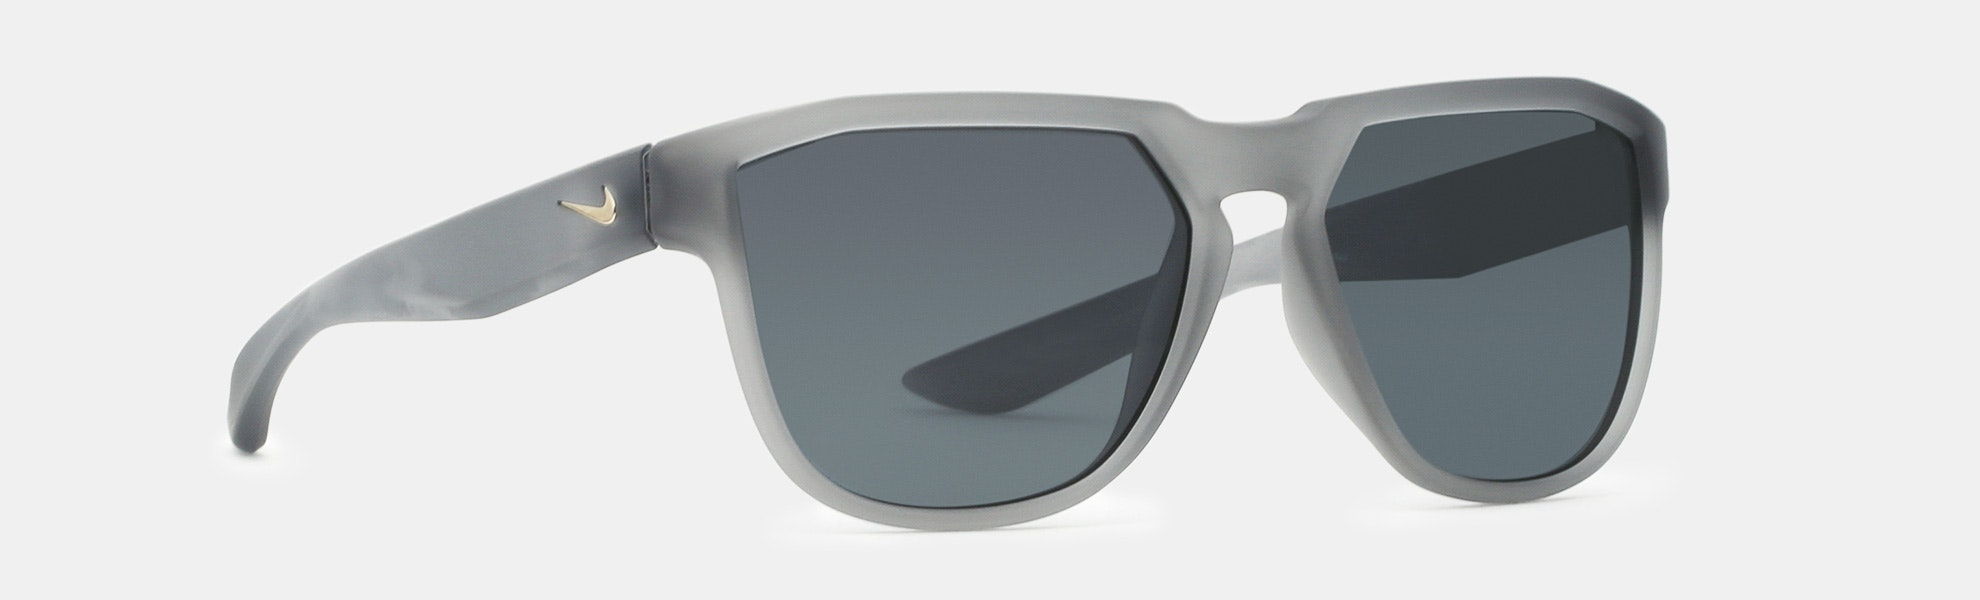 Nike Fly Swift Sunglasses